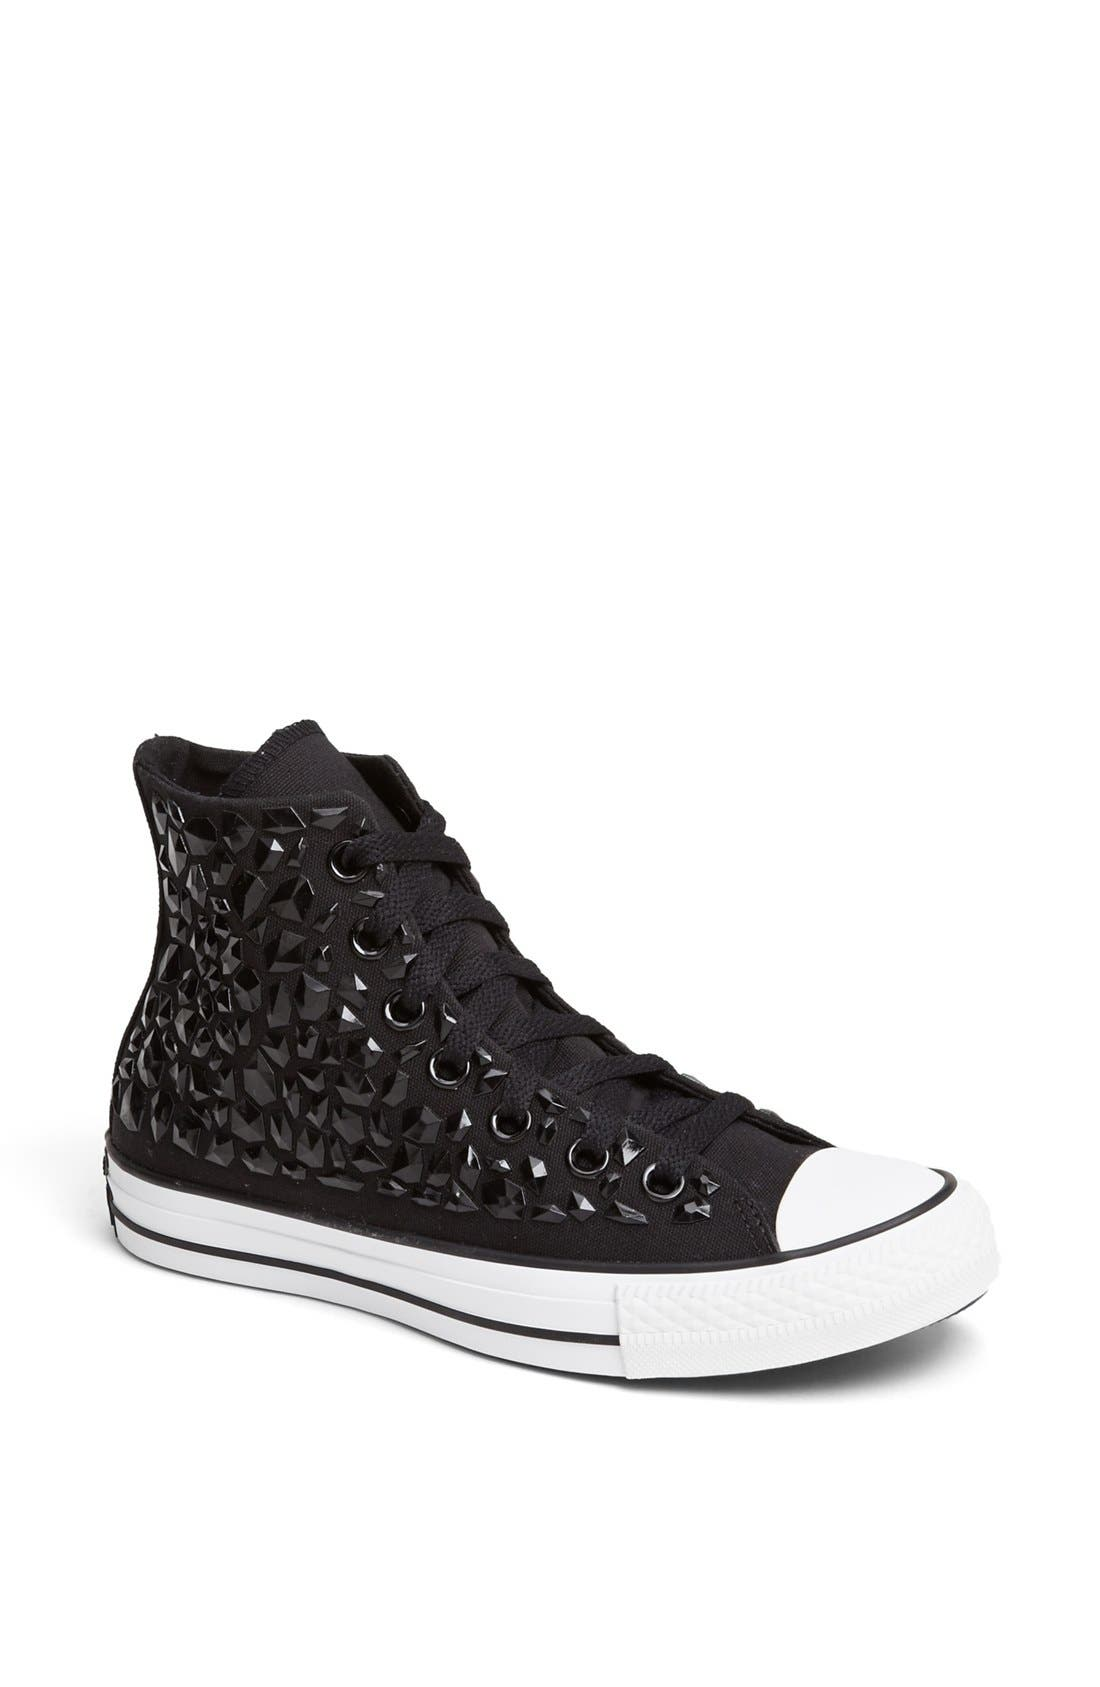 Alternate Image 1 Selected - Converse Chuck Taylor® All Star® 'Rhinestone' High Top Sneaker (Women)